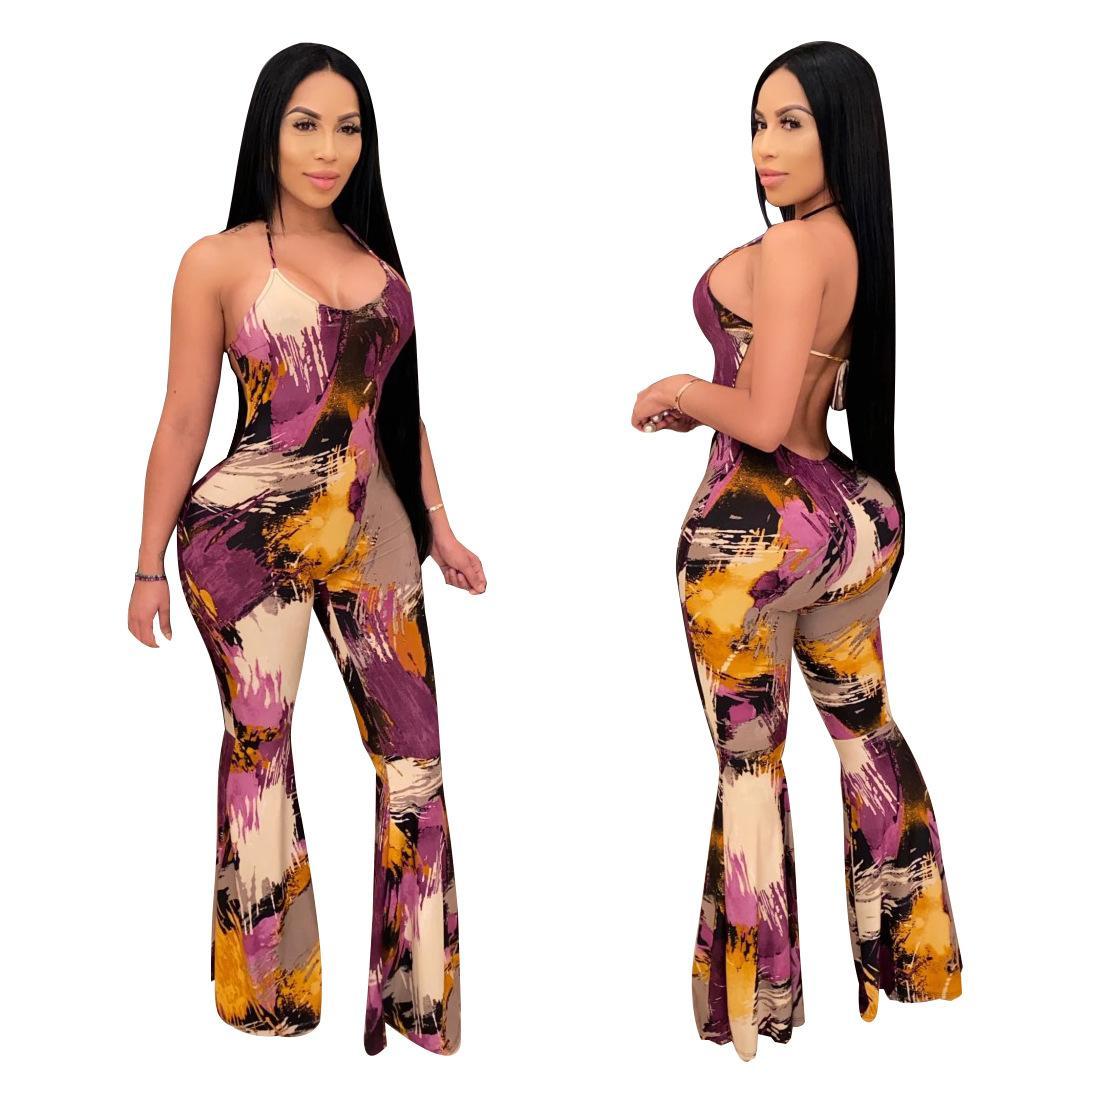 Dame Sexy Nightclub Jumpsuits Bezaubernd Frauen Halter Lace-up Sleeveless Backless Dünne Krawatte-Farbstoff-Druckfarbe-Strampler